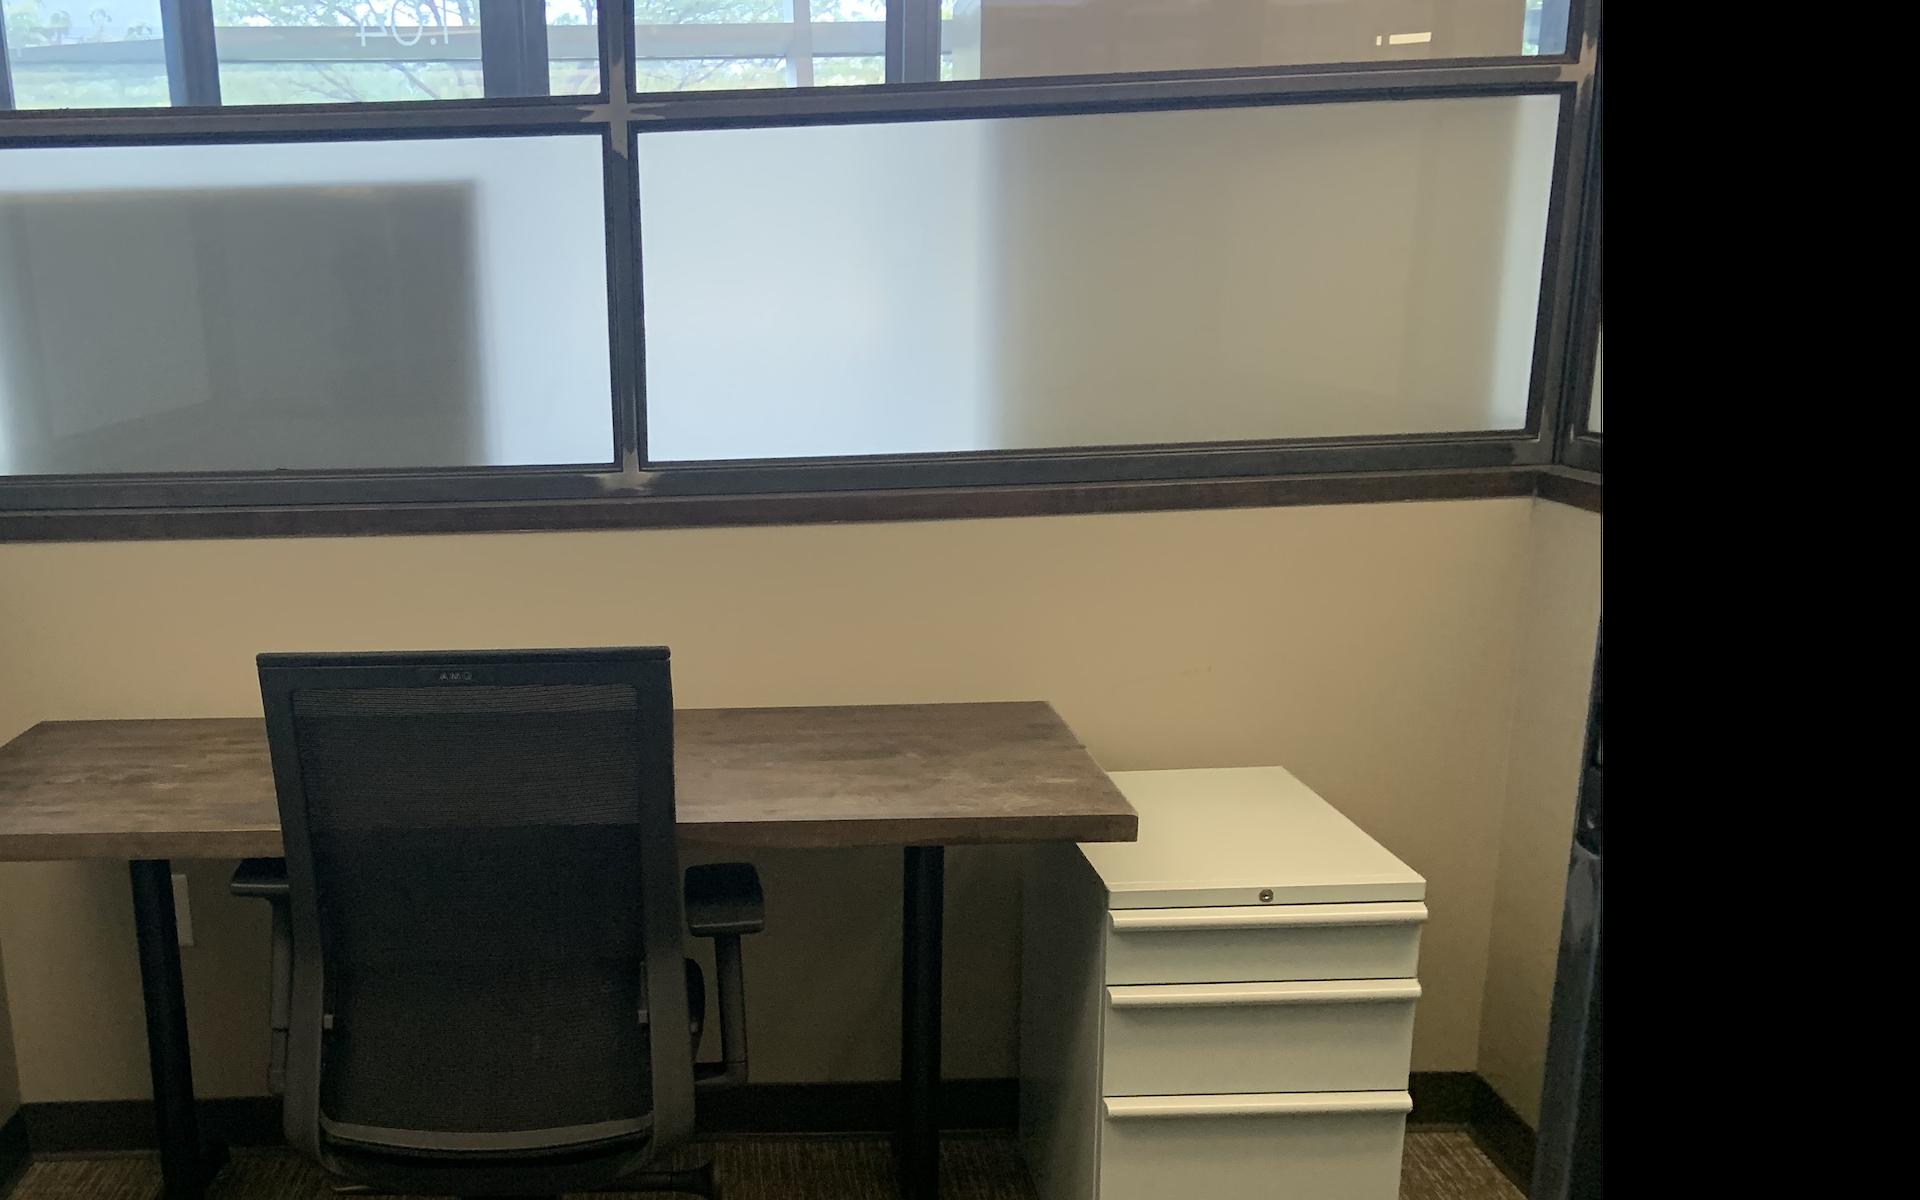 Versa Grandview - Private One-person Office